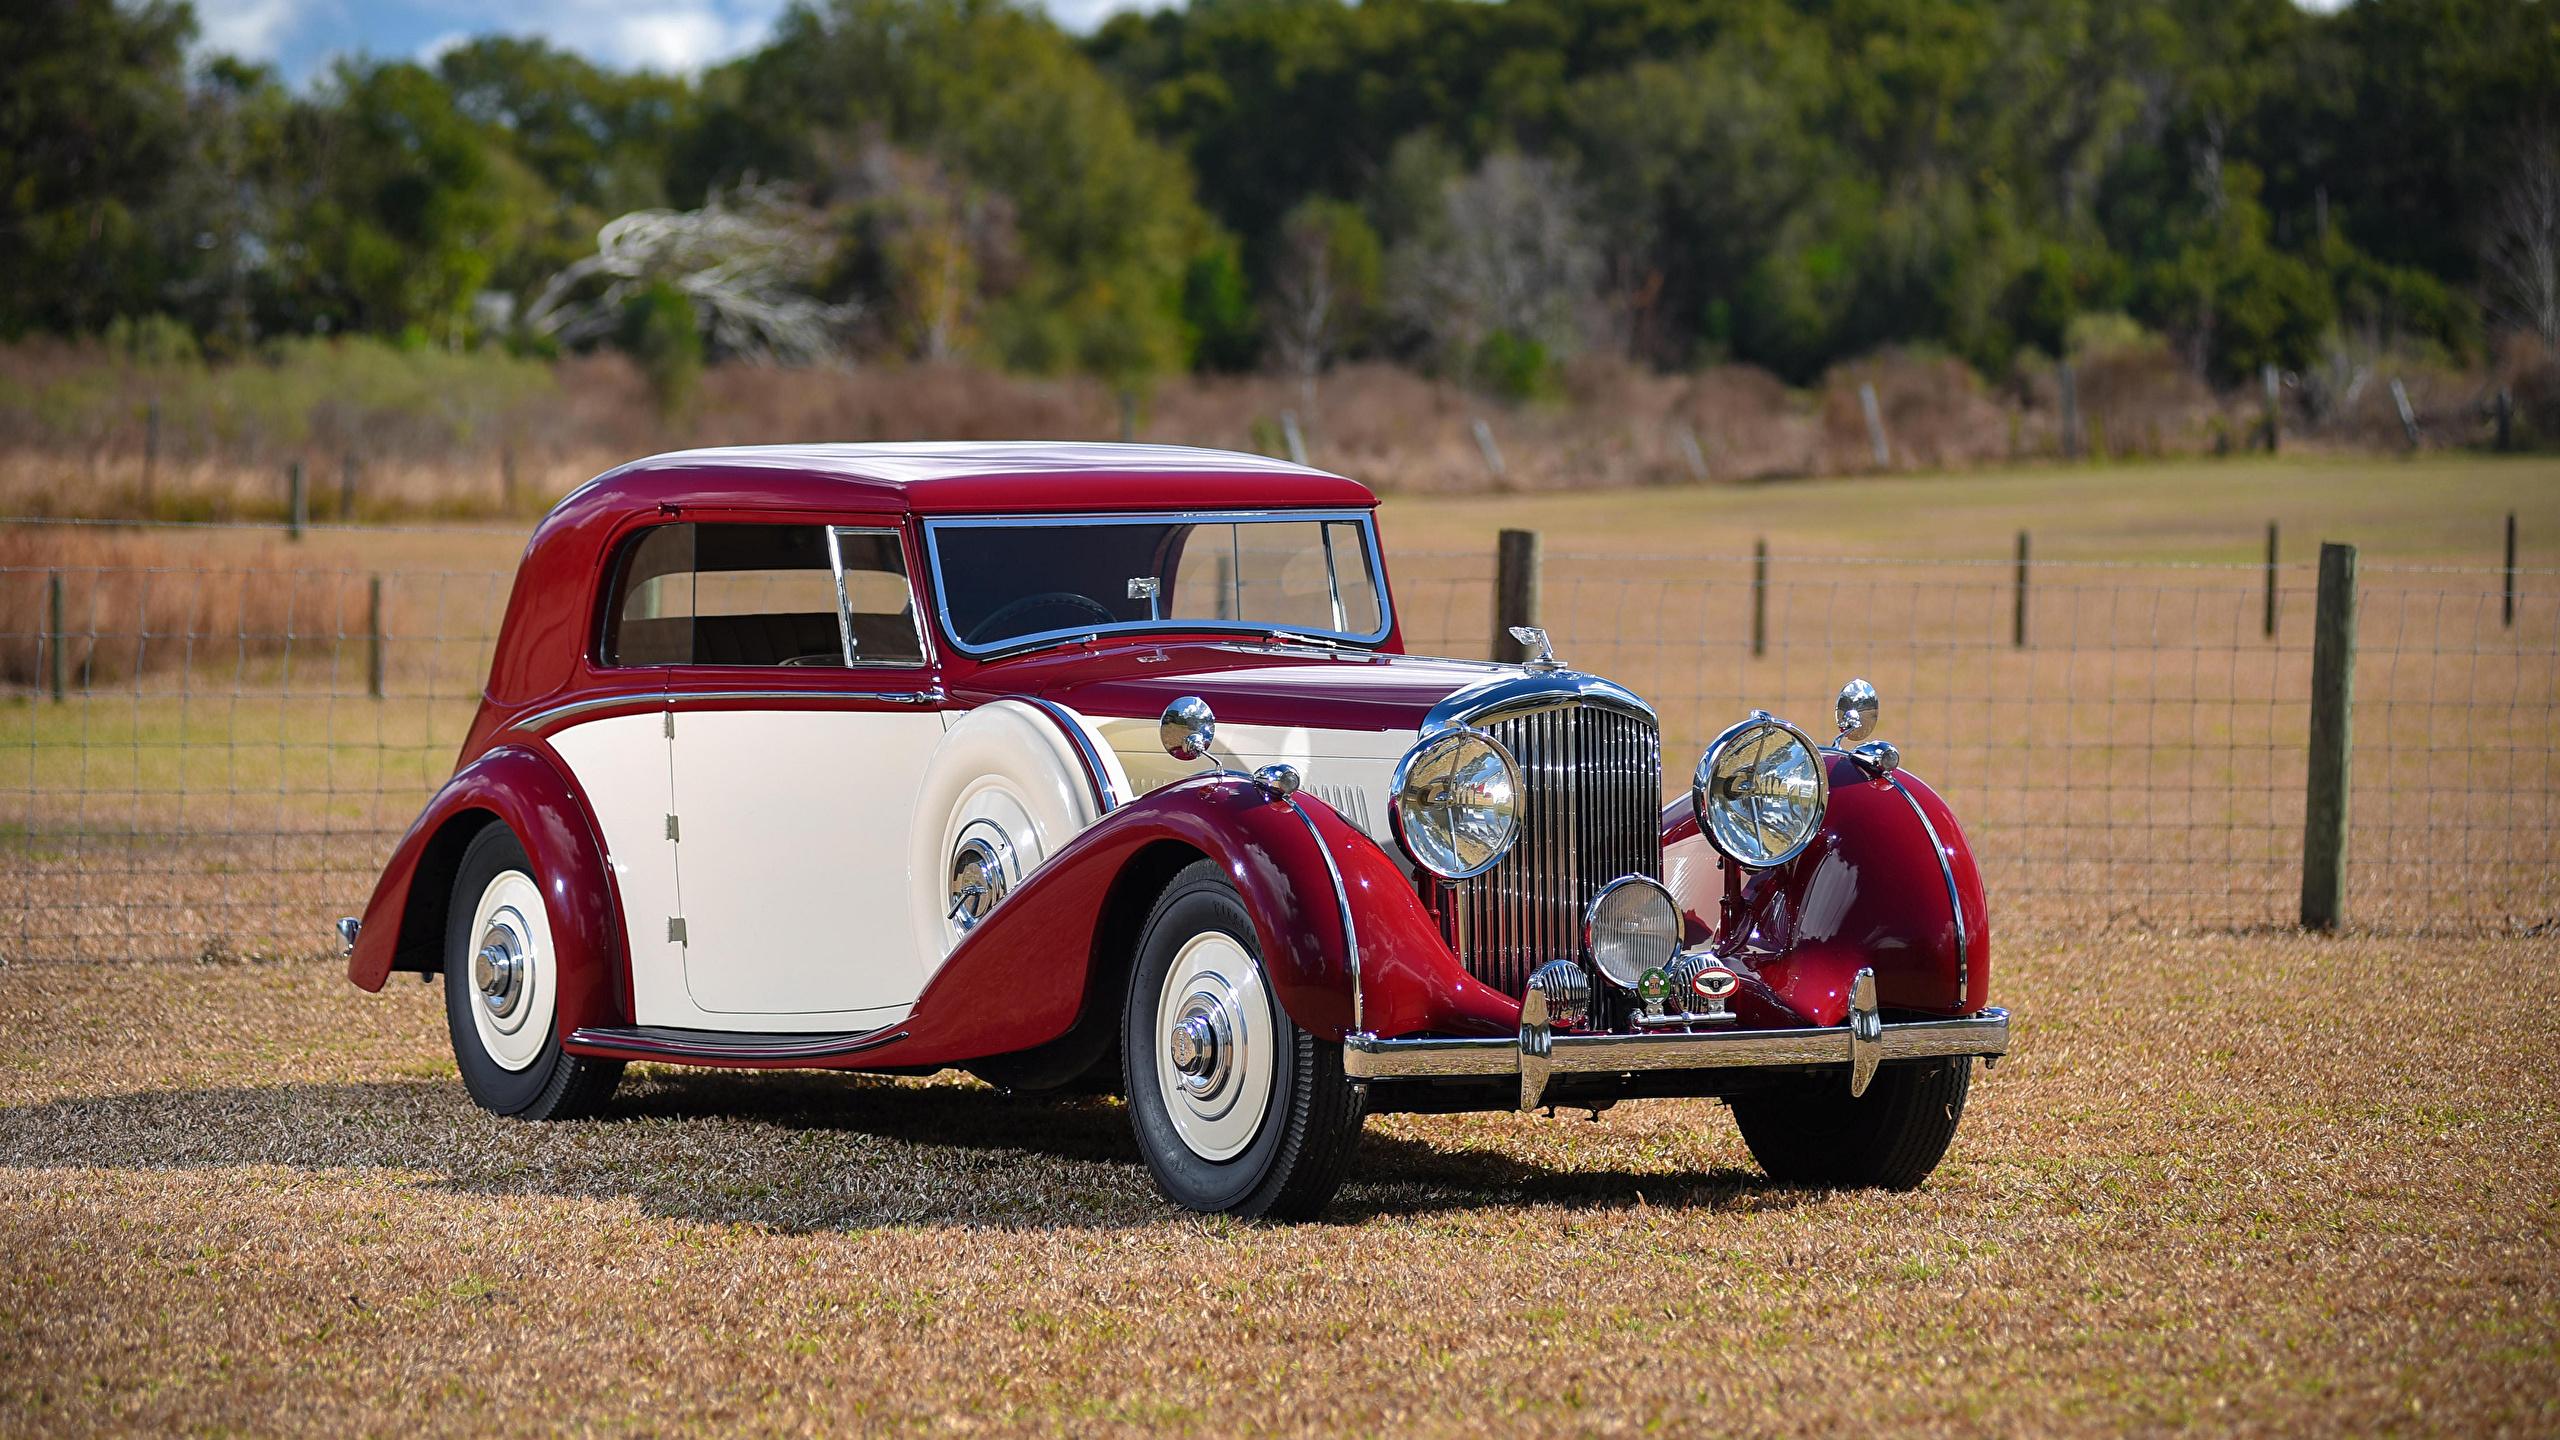 Photo Bentley Vintage Metallic Automobile 2560x1440